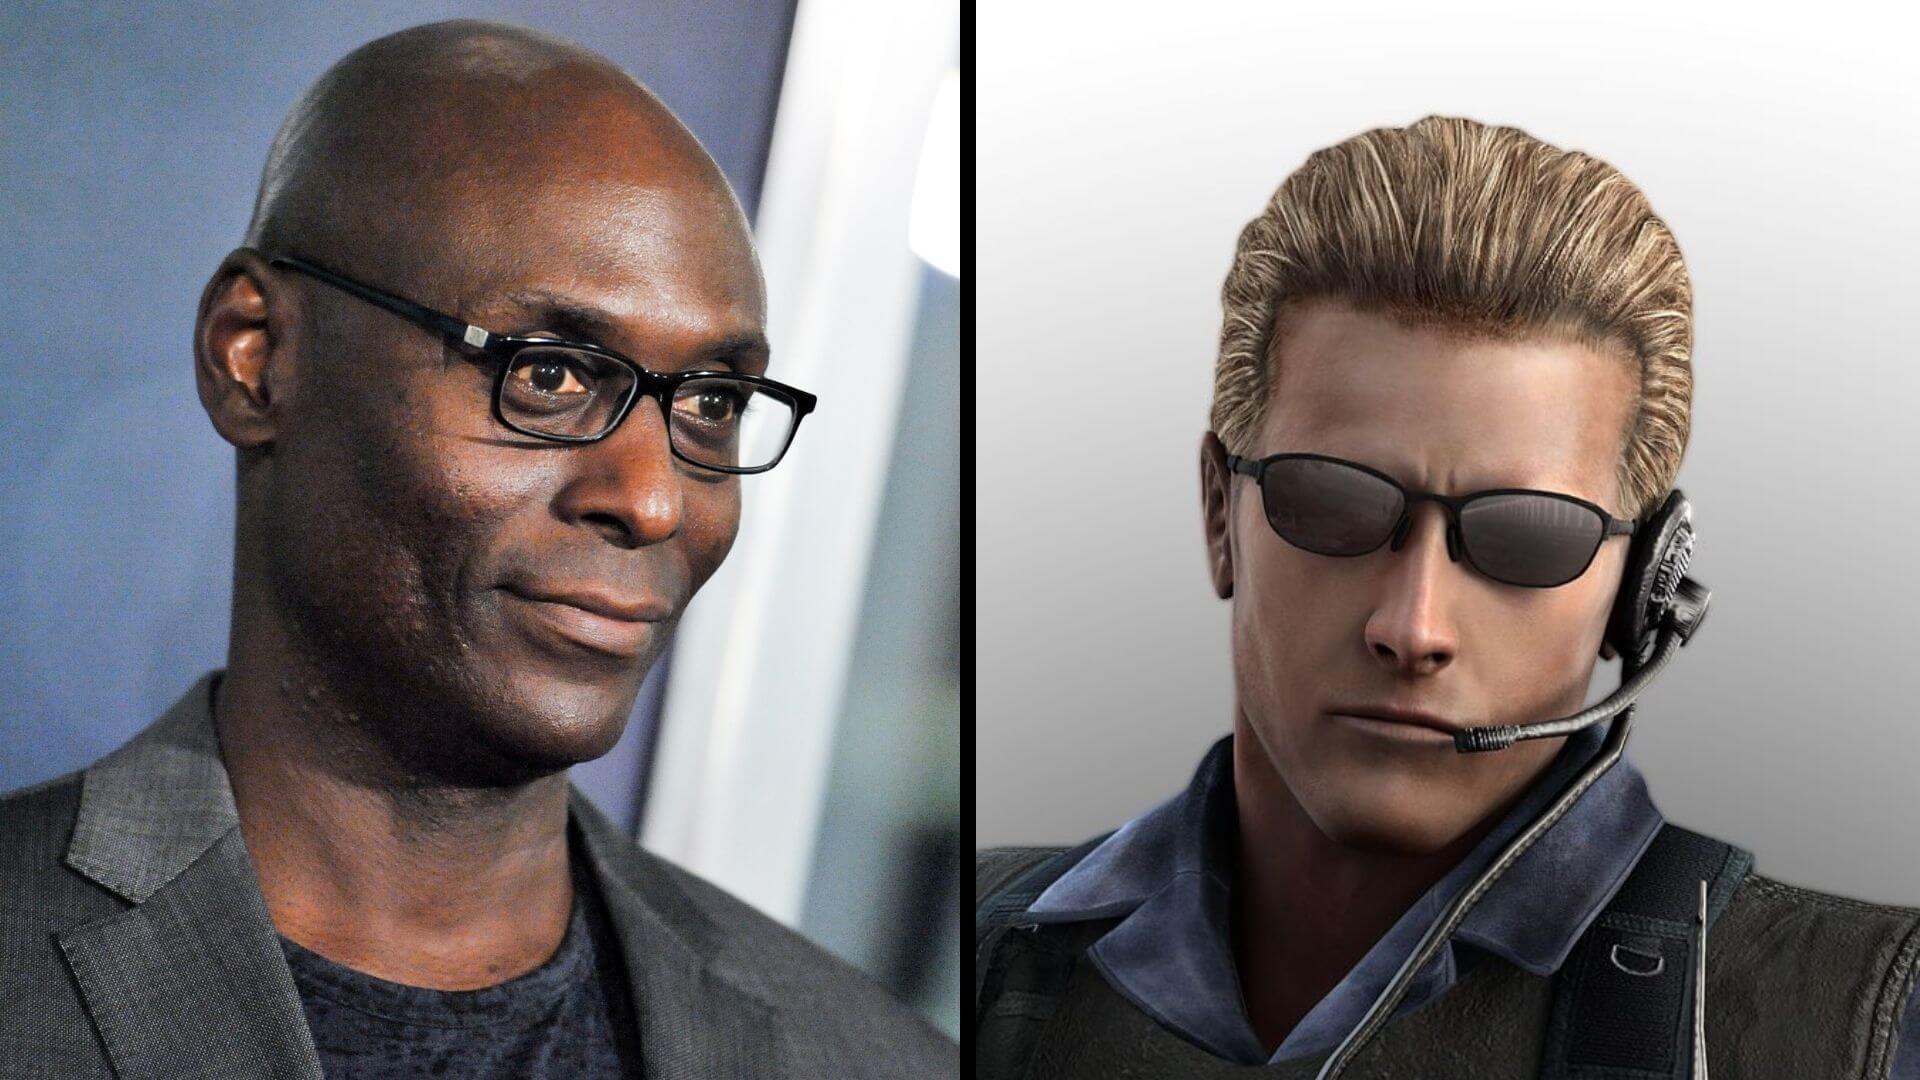 Lance Reddick interpretará a Albert Wesker en la serie de Resident Evil